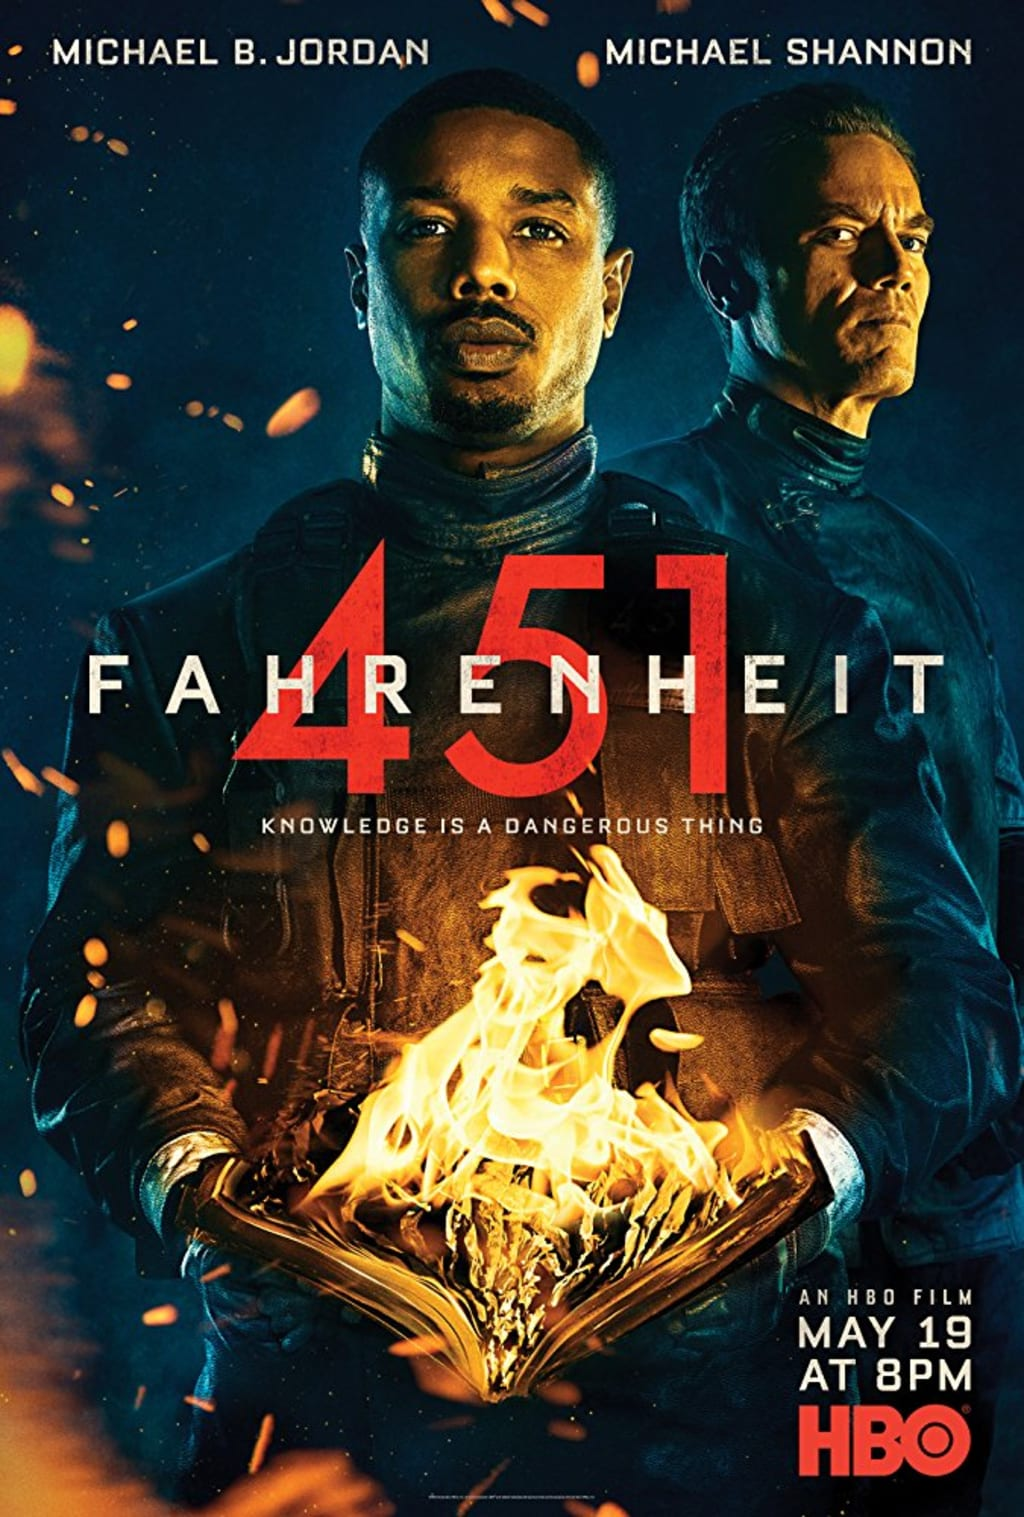 Review of 'Fahrenheit 451'